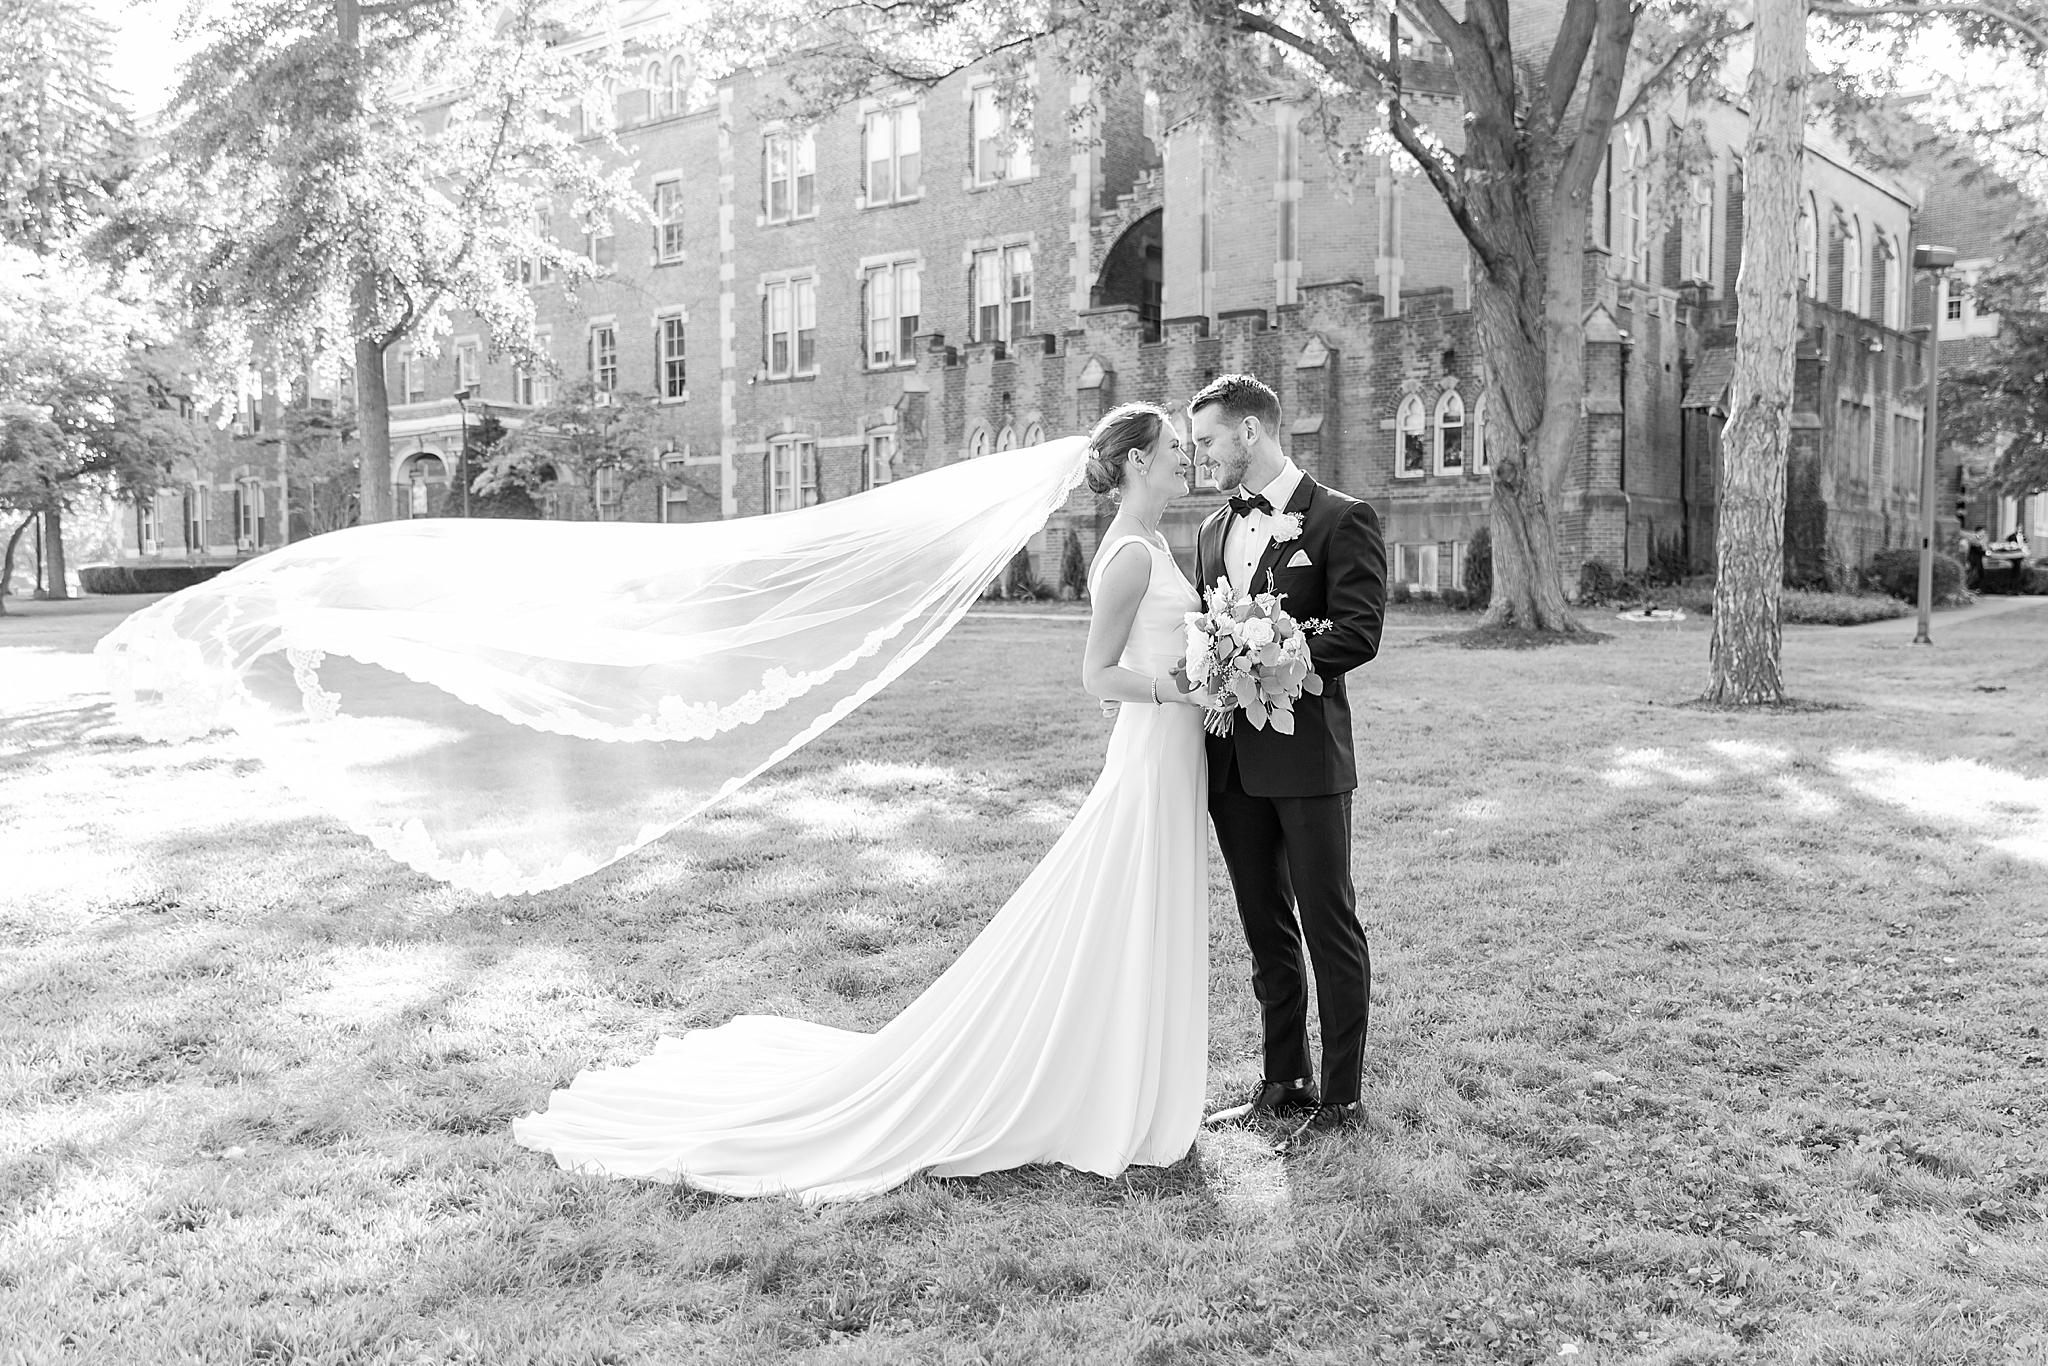 detroit-wedding-photographer-grosse-pointe-academy-chapel-detroit-golf-club-wedding-carly-matt-by-courtney-carolyn-photography_0081.jpg